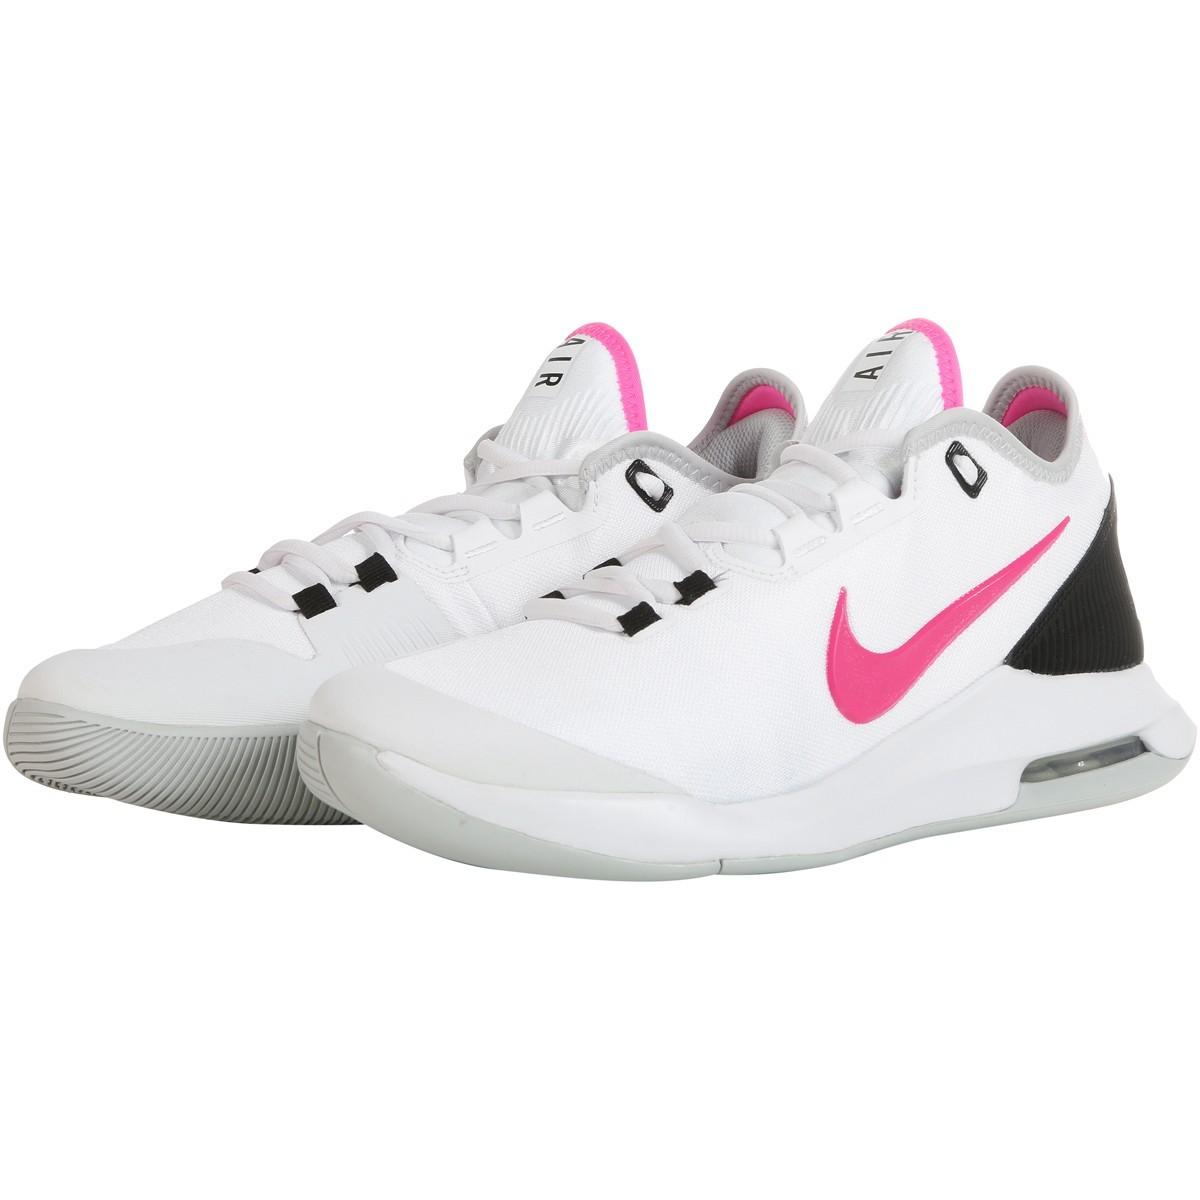 Теннисные кроссовки женские Nike WMNS Air Max Wildcard white/laser fuchsia/grey fog